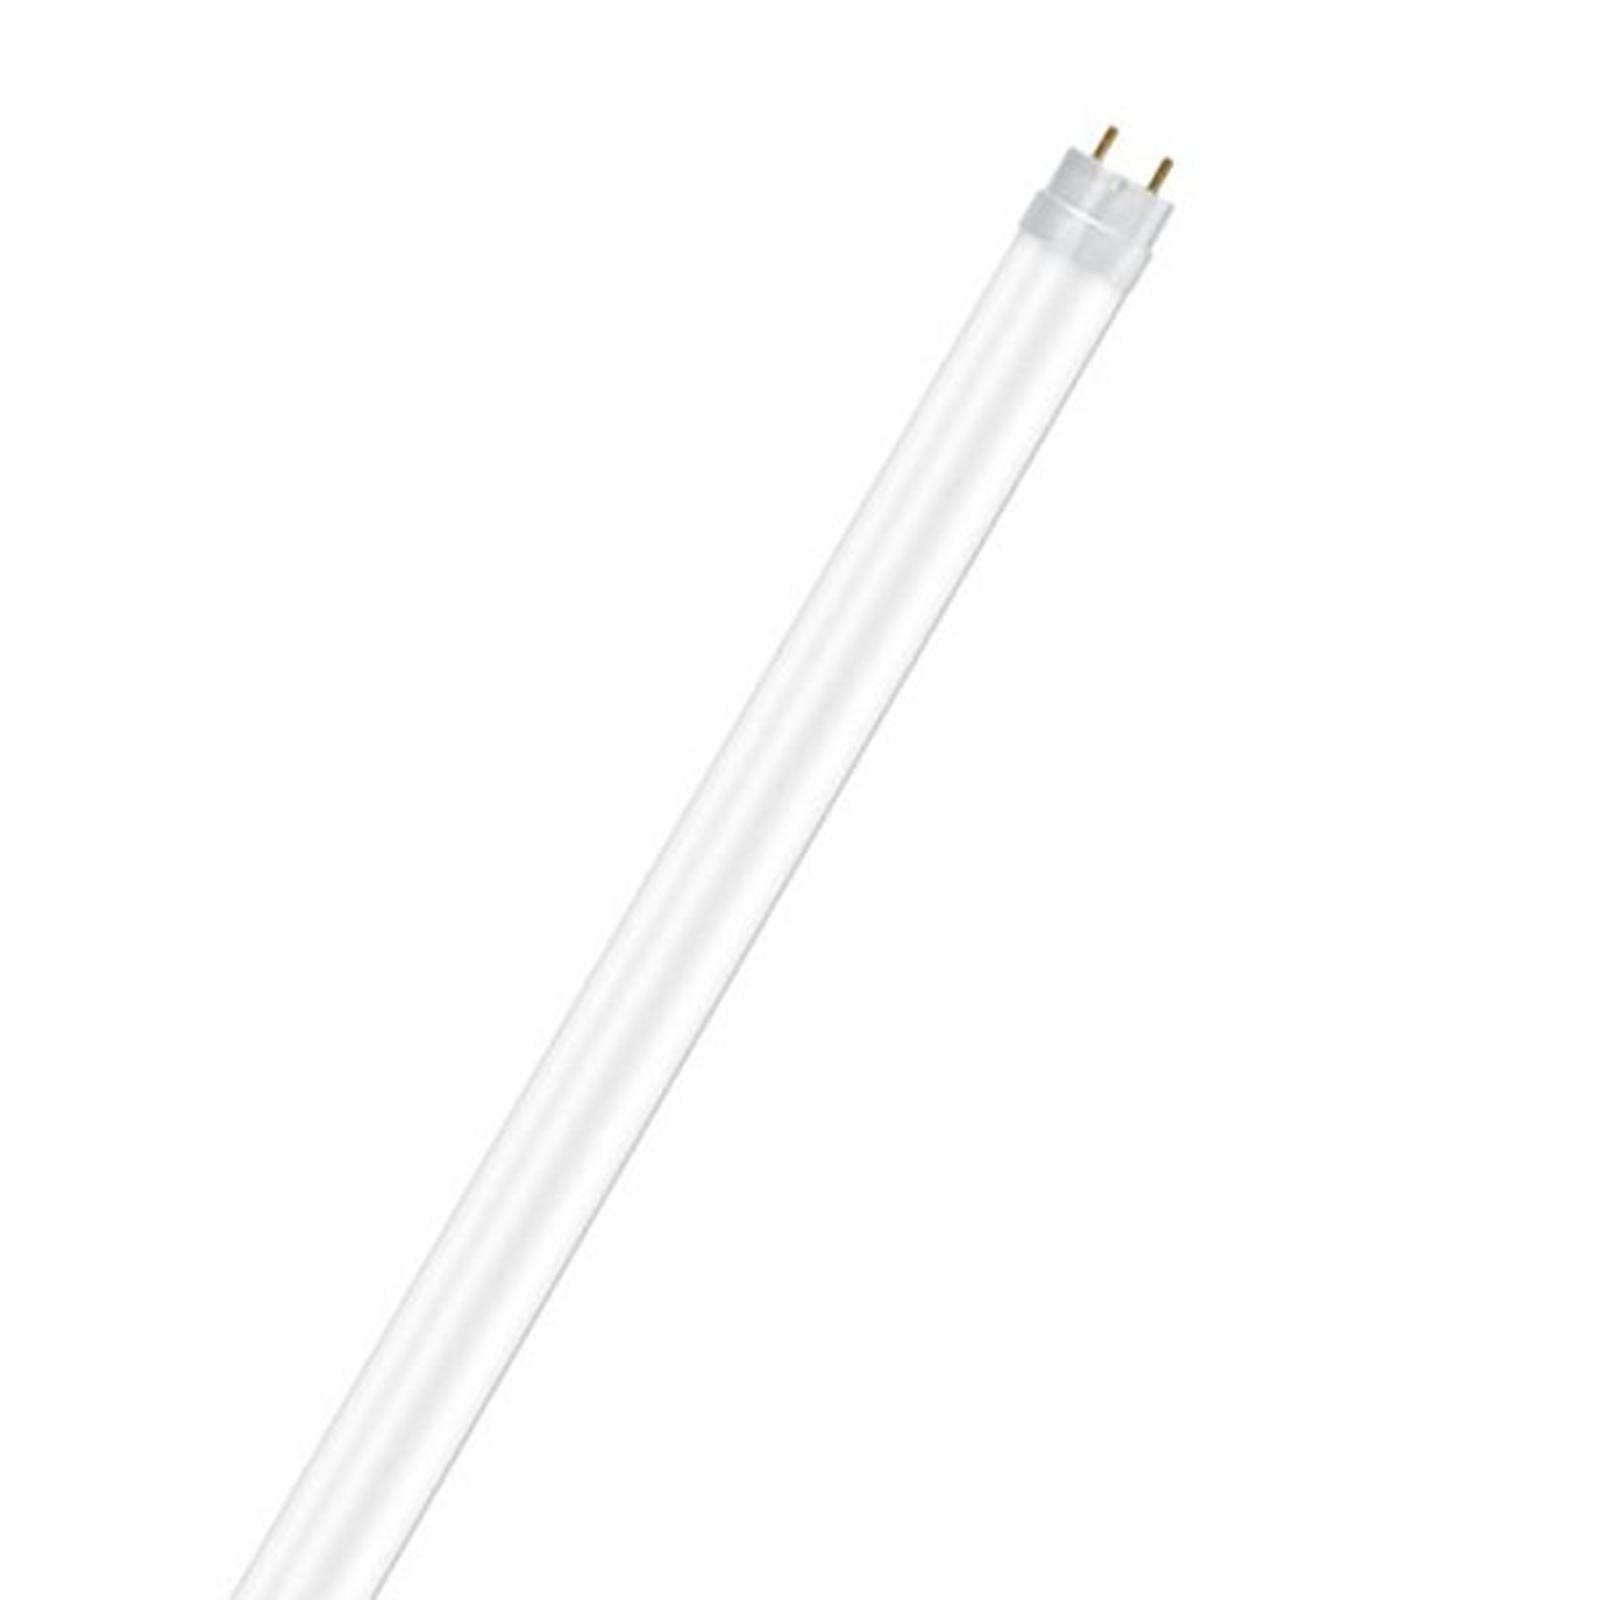 OSRAM LED-Röhre G13 120cm SubstiTUBE 16W 3000K